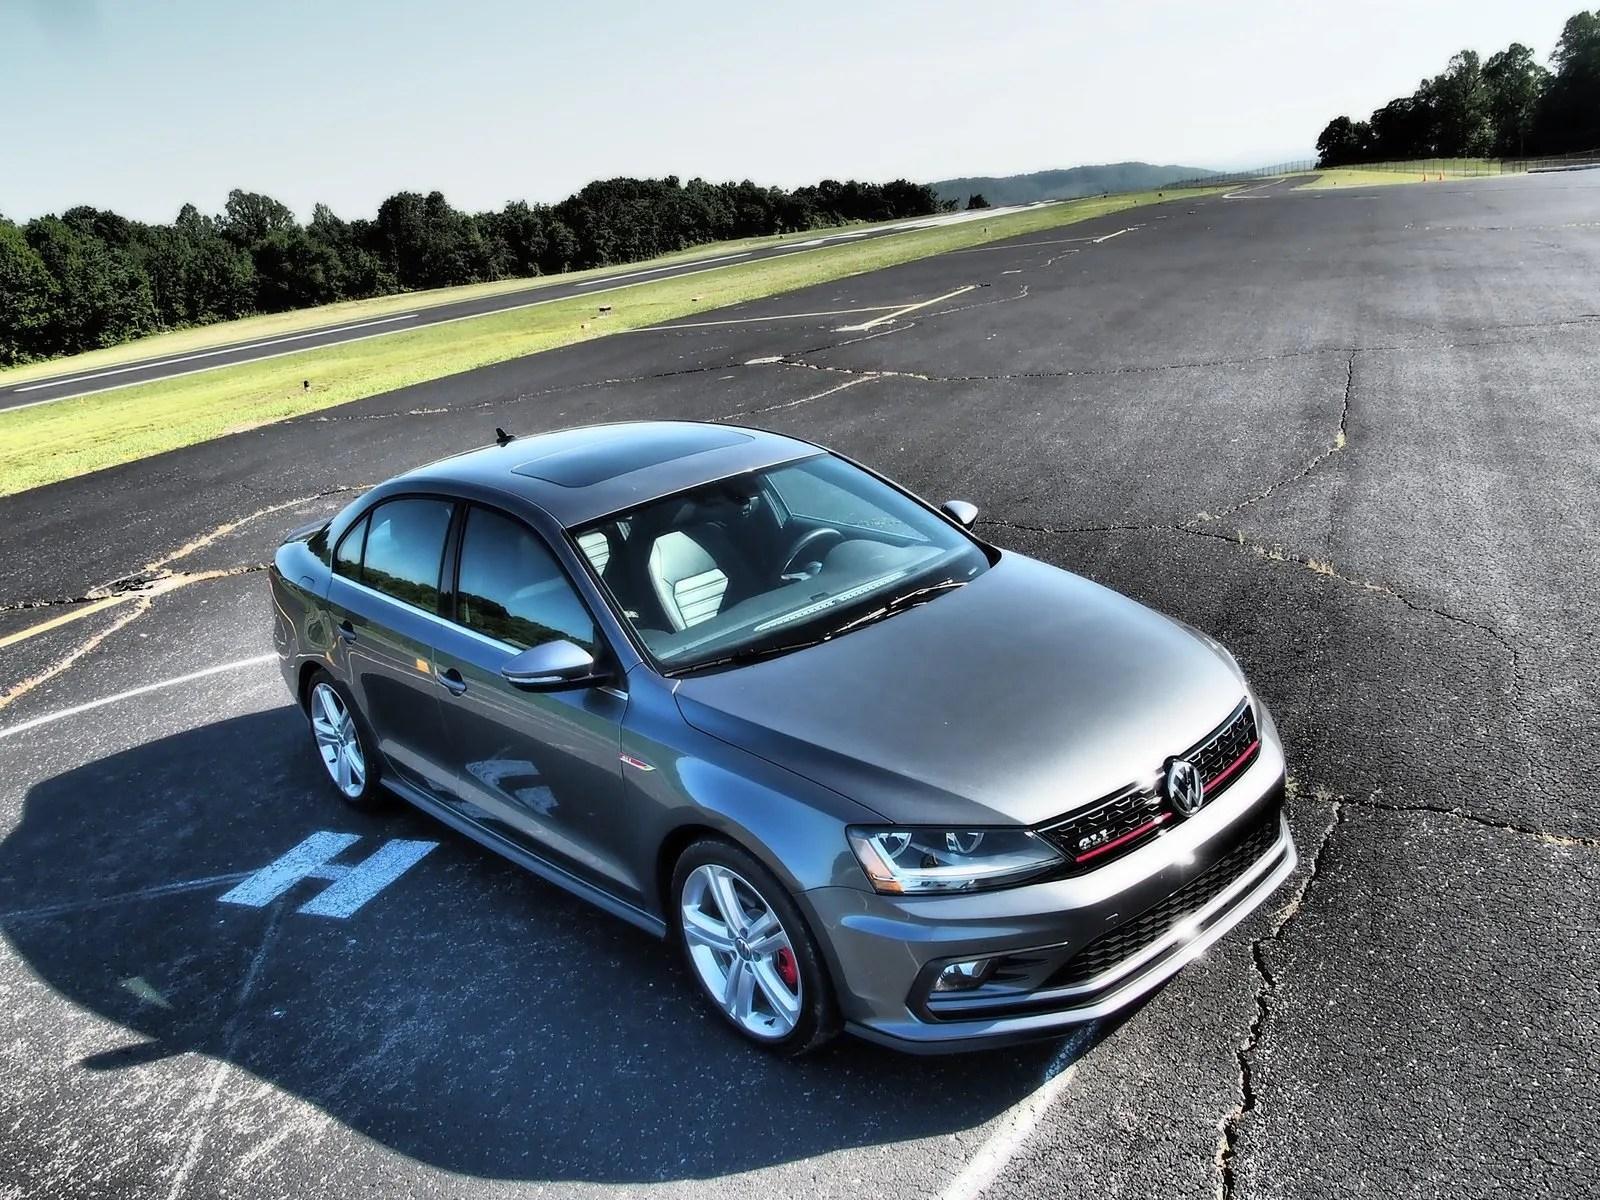 2017 Volkswagen Gli Driven Pictures Photos Wallpapers